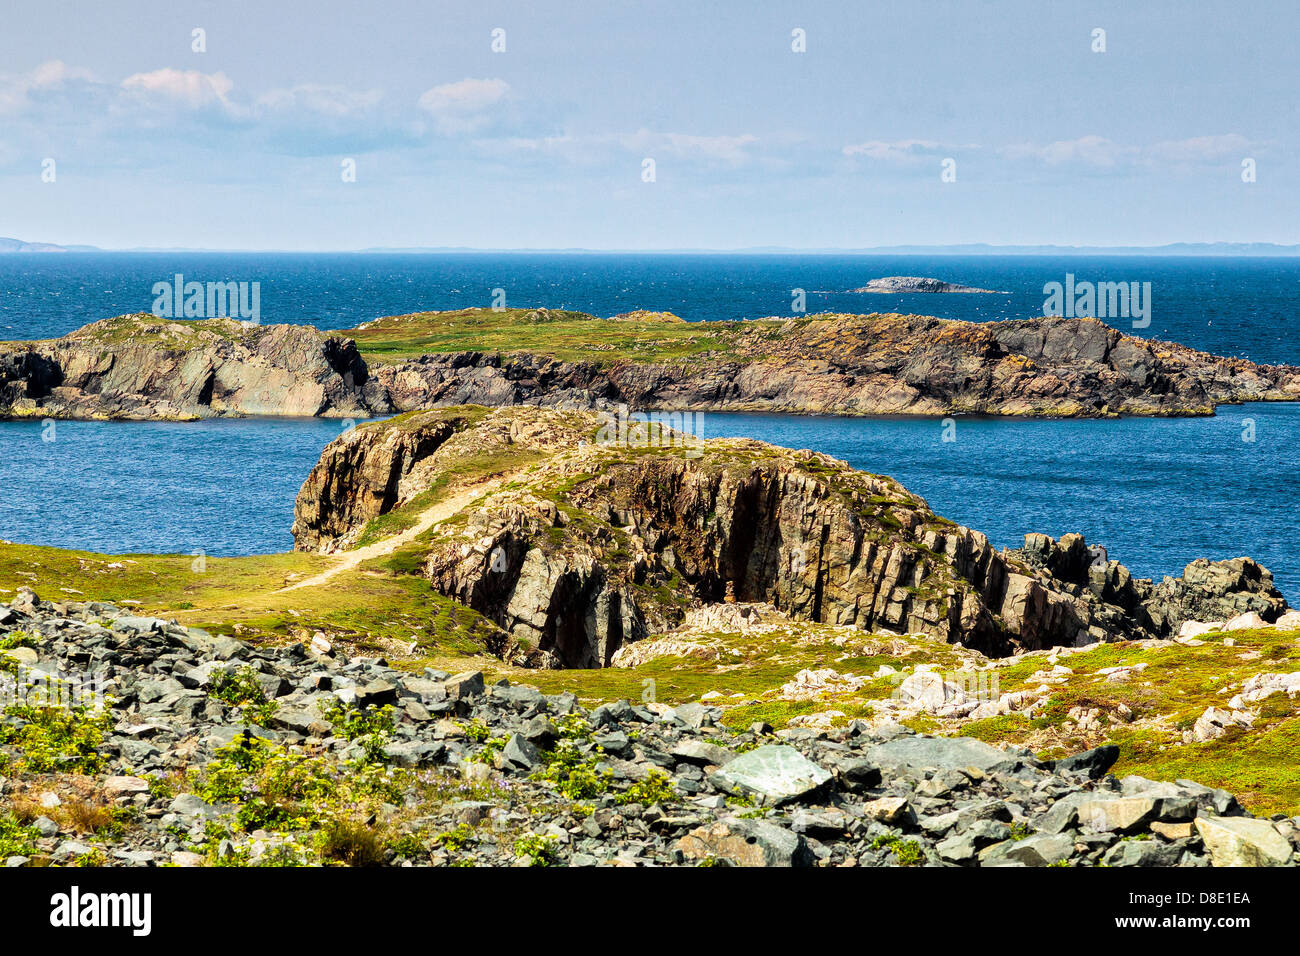 Dramatic Seascape View from Cape Bonavista, Newfoundland - Stock Image